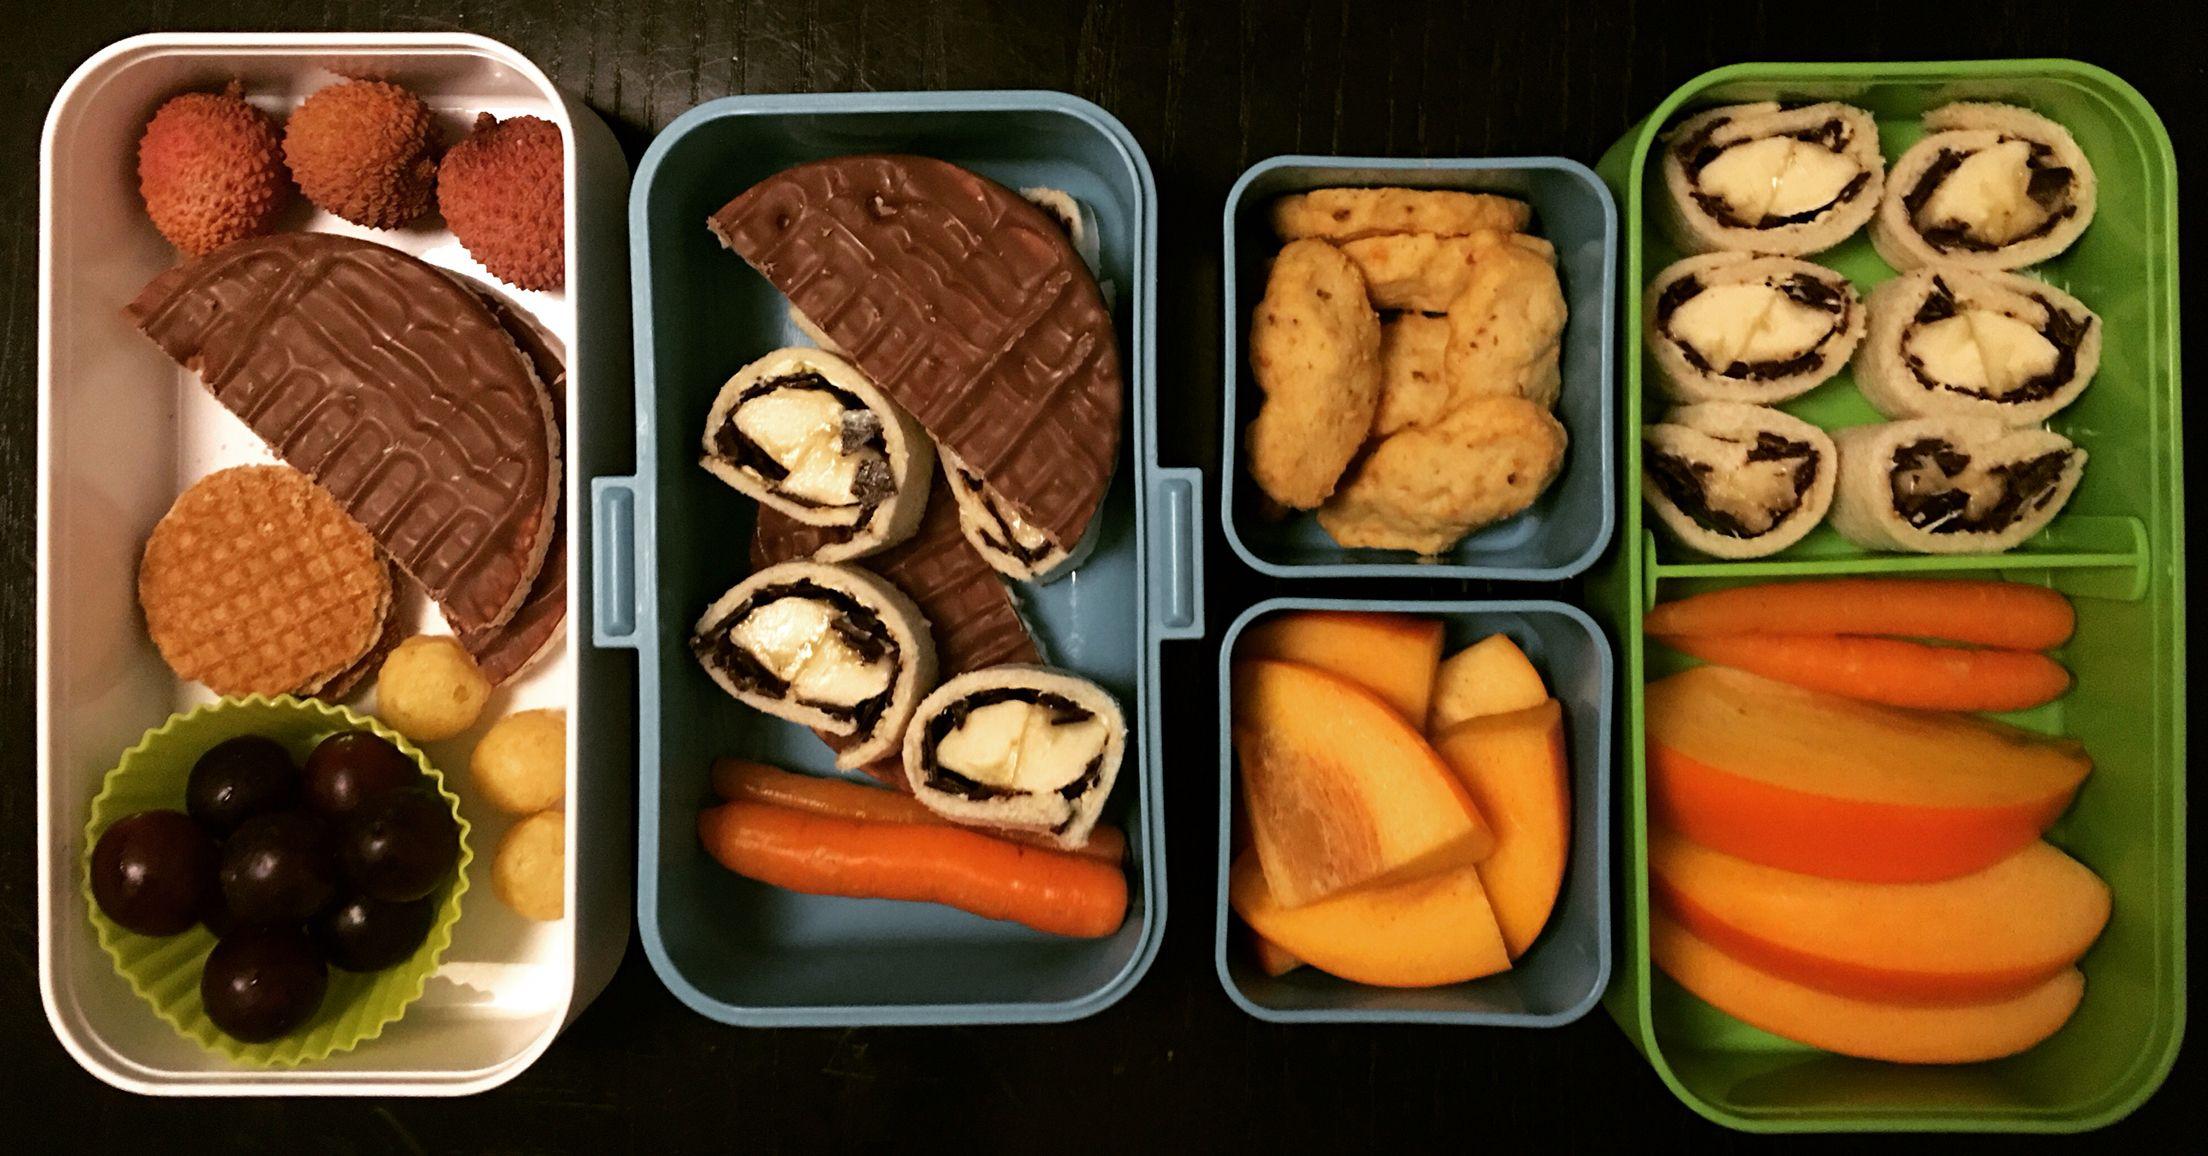 #lunchbox #deluxe #bento #monbento #breakfastsushi #yummy #delicious #lunch #snack #kids